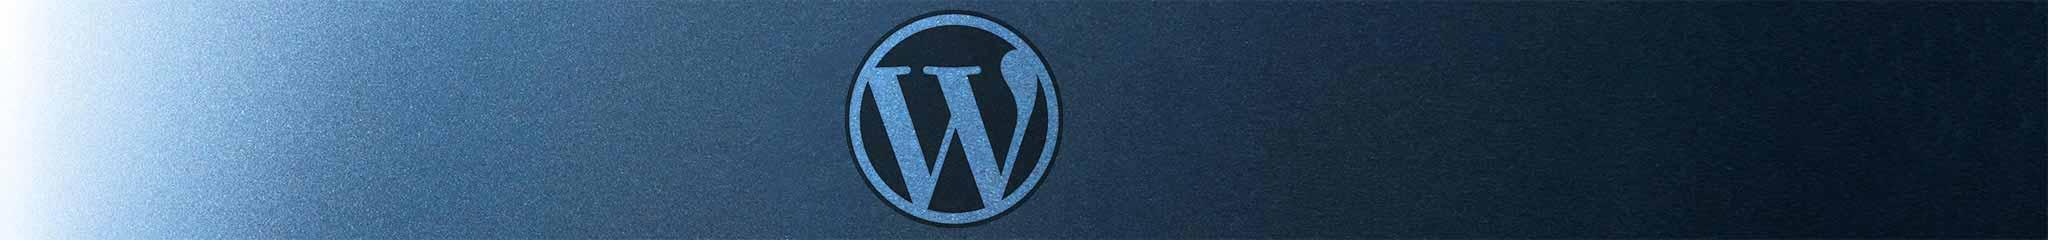 WordPress-Training und Coaching mit mindsup.de